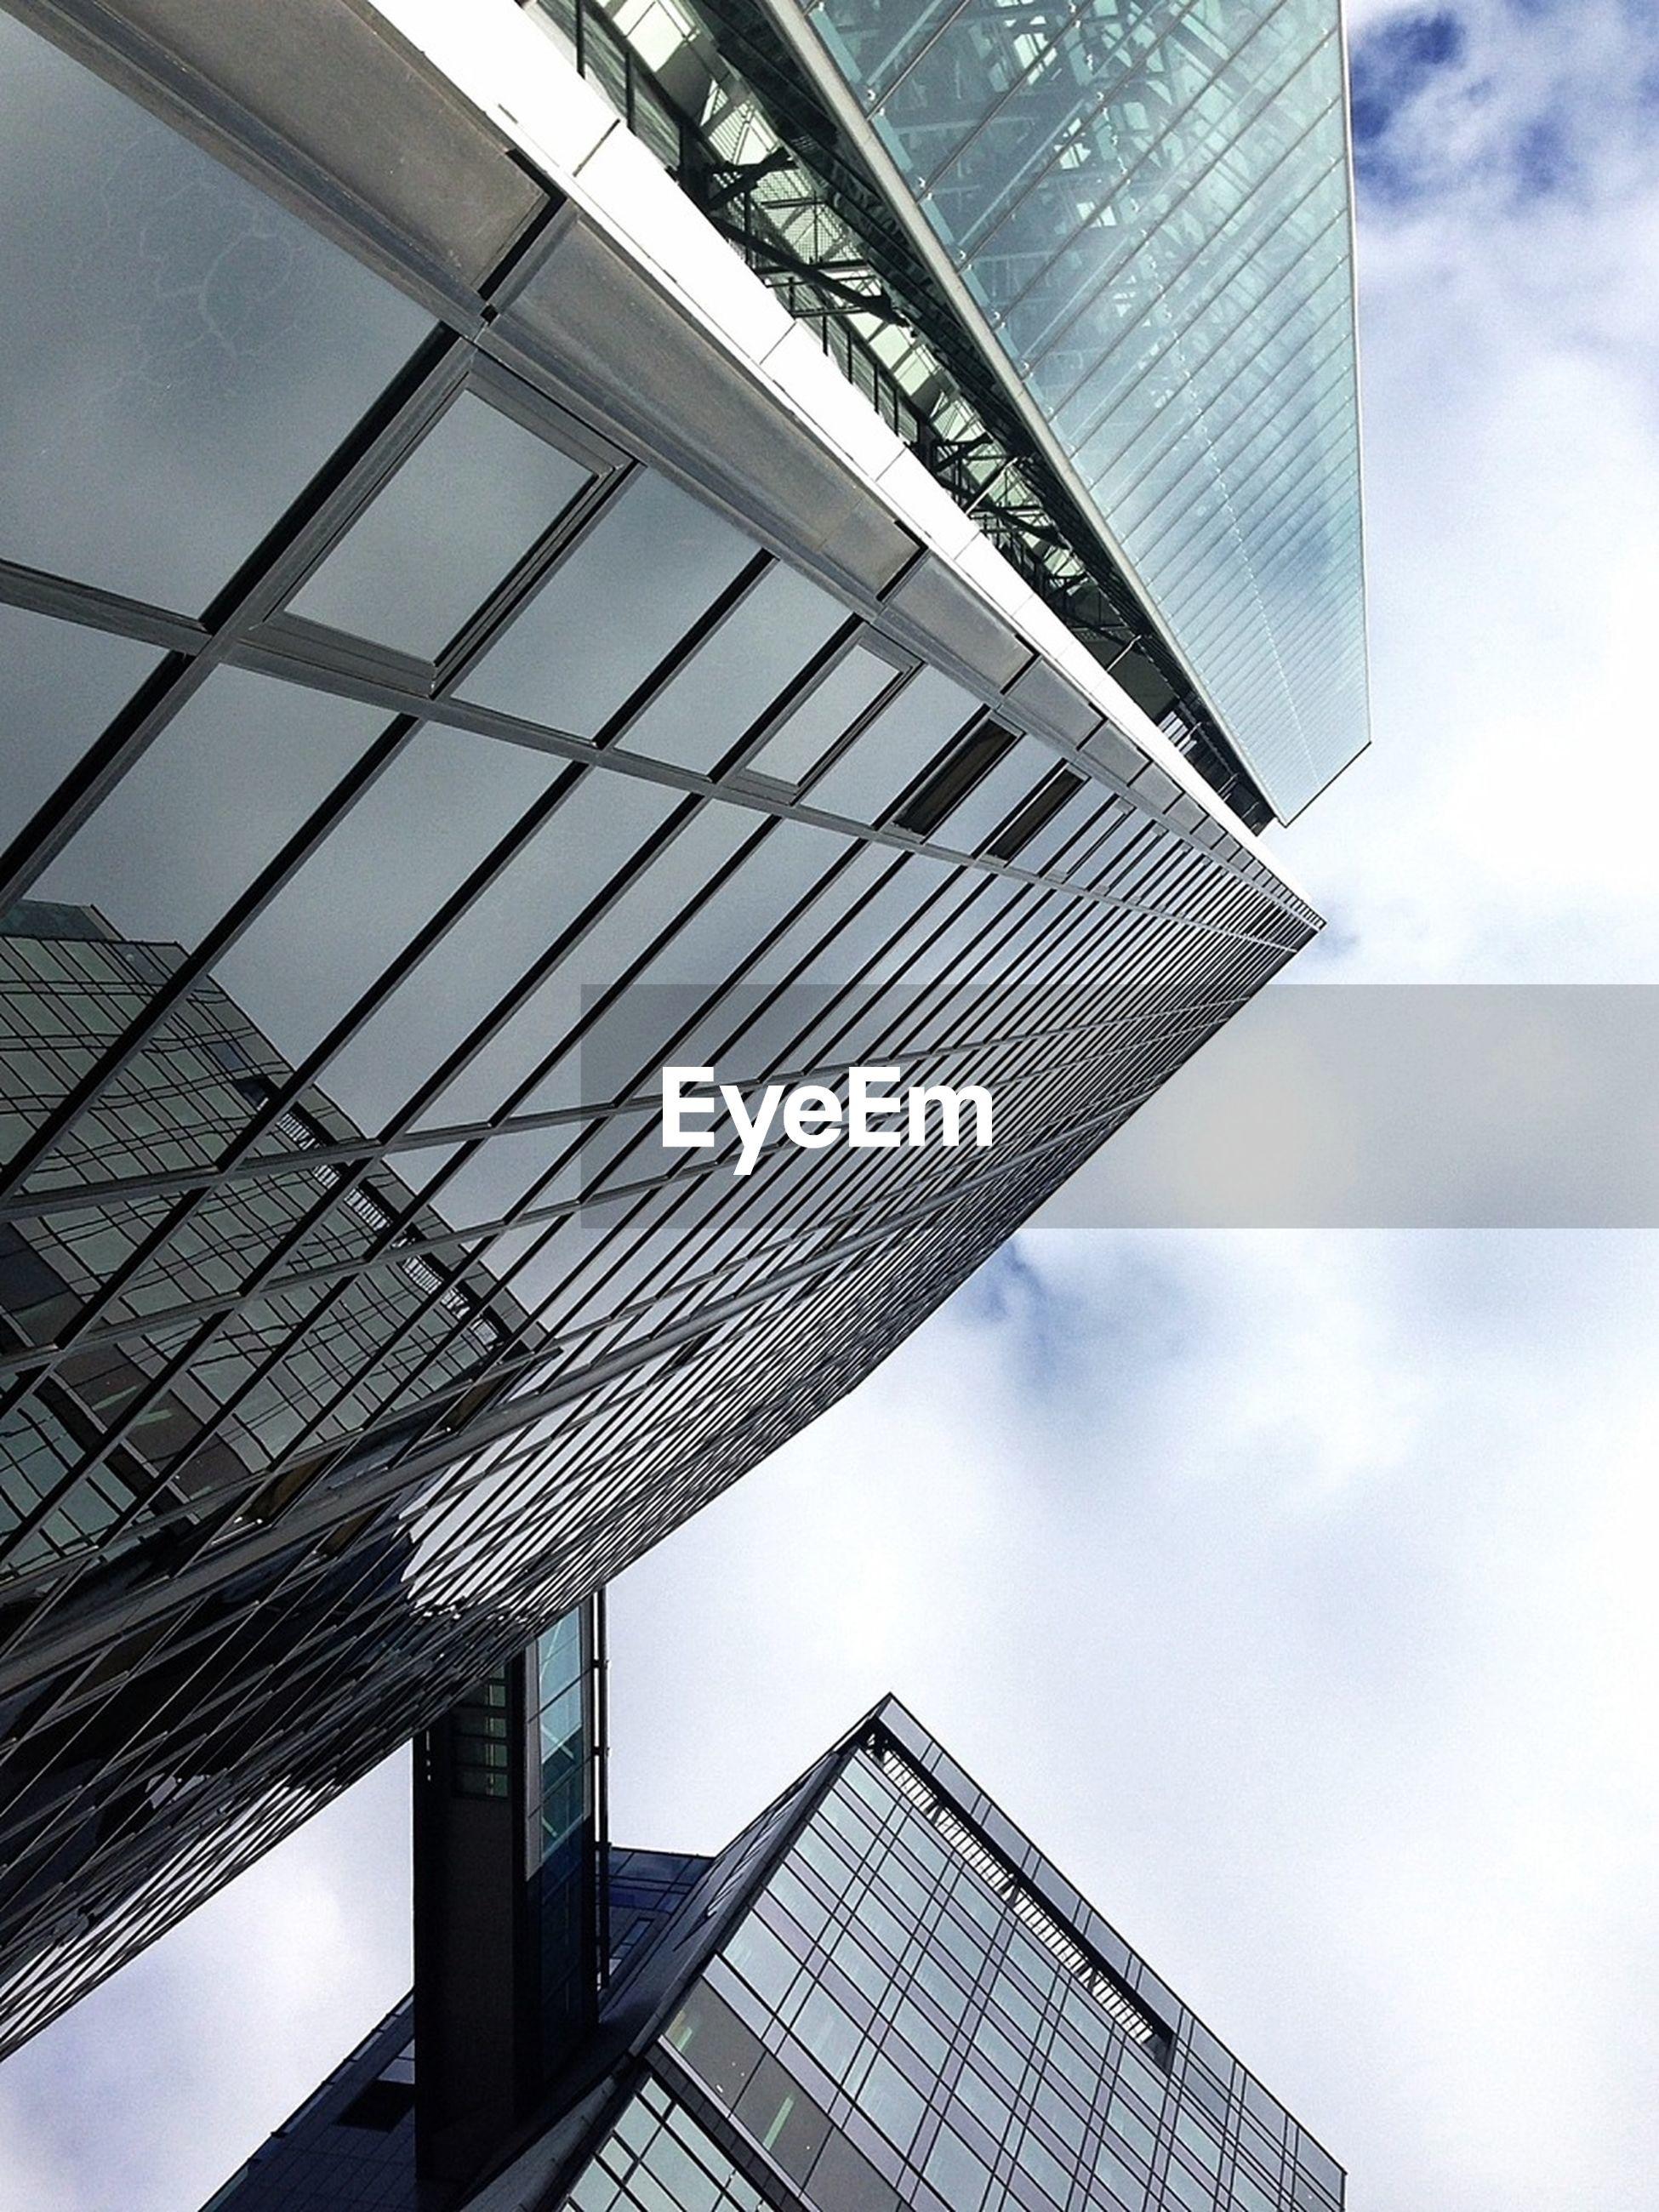 Directly below shot of modern buildings against cloudy sky